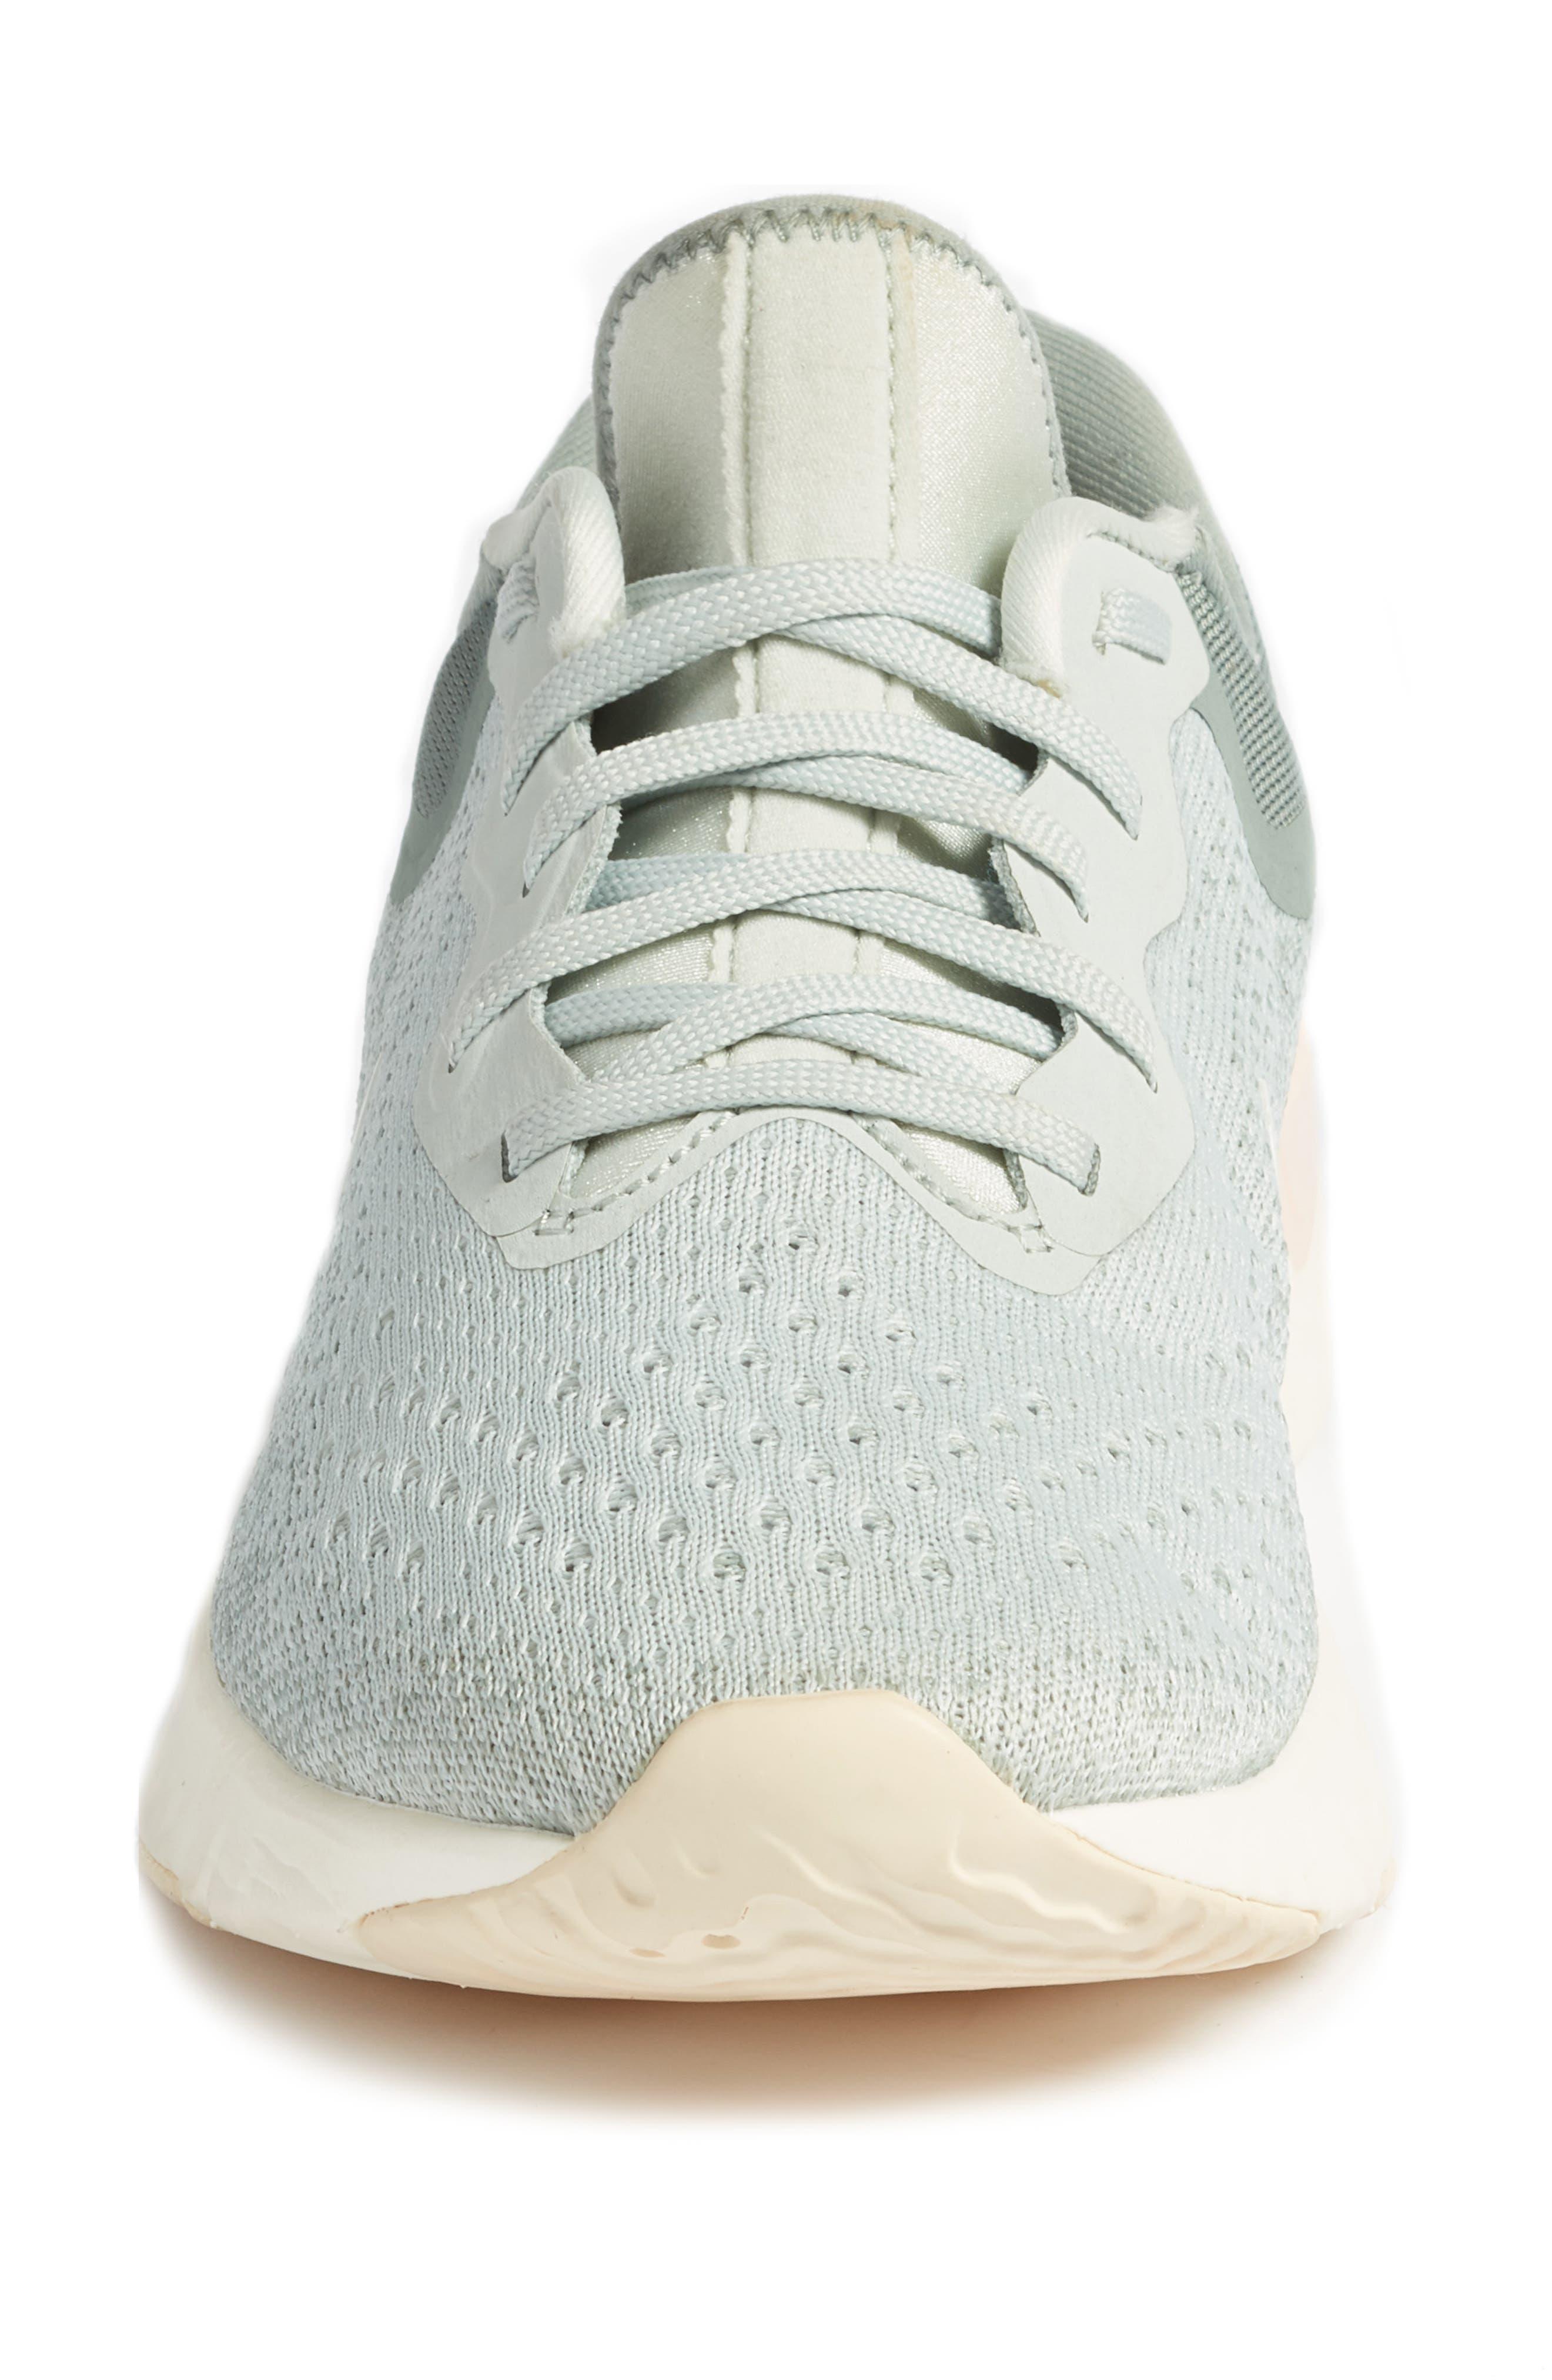 Odyssey React Running Shoe,                             Alternate thumbnail 4, color,                             LIGHT SILVER/ SAIL/ MICA GREEN